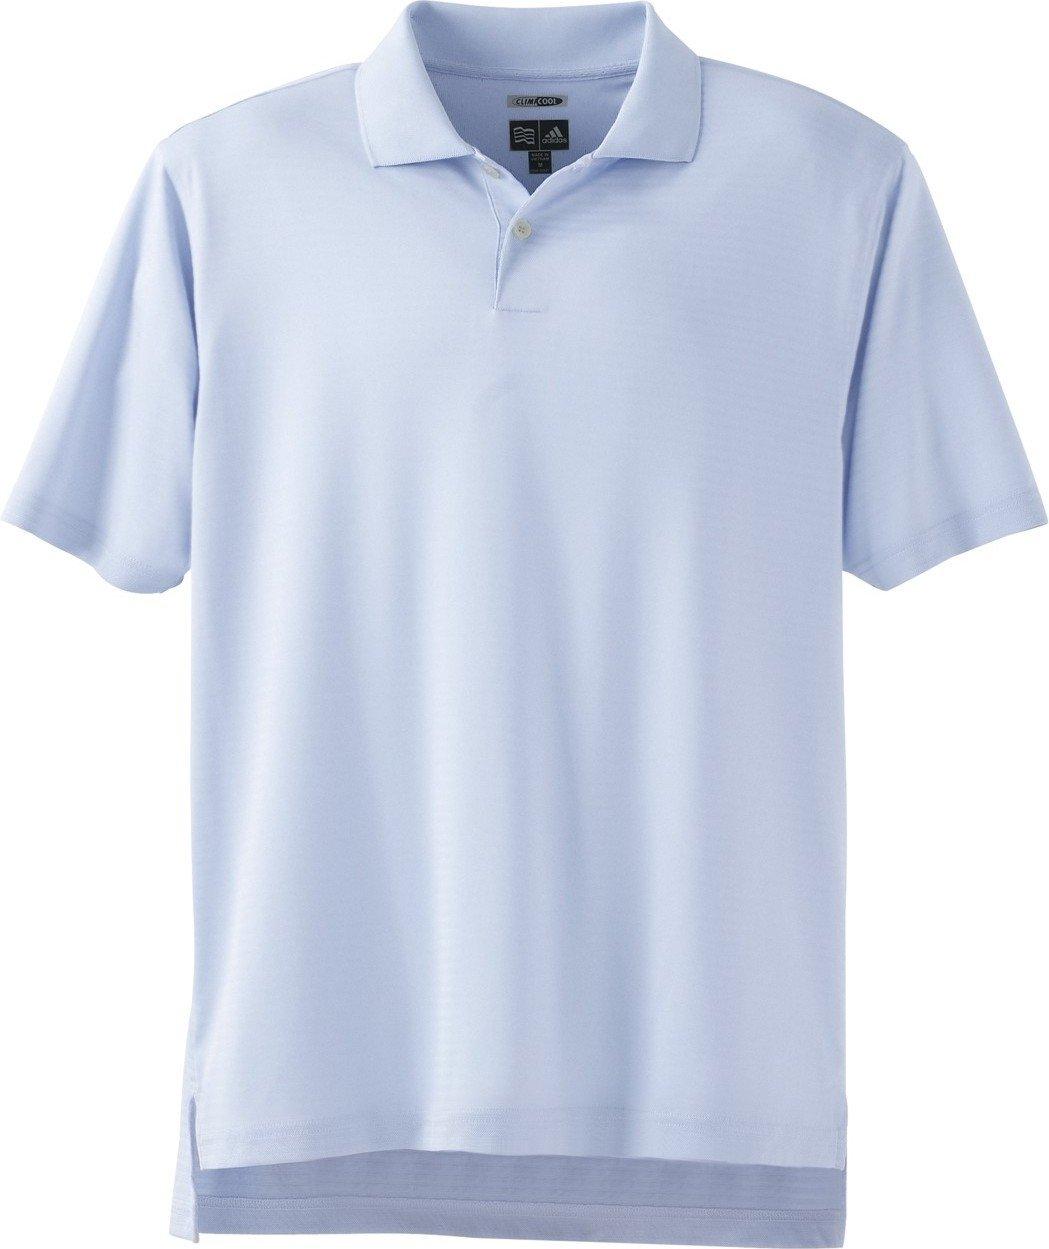 3fa8838a Adidas Mens Climacool Polo Shirt - DREAMWORKS